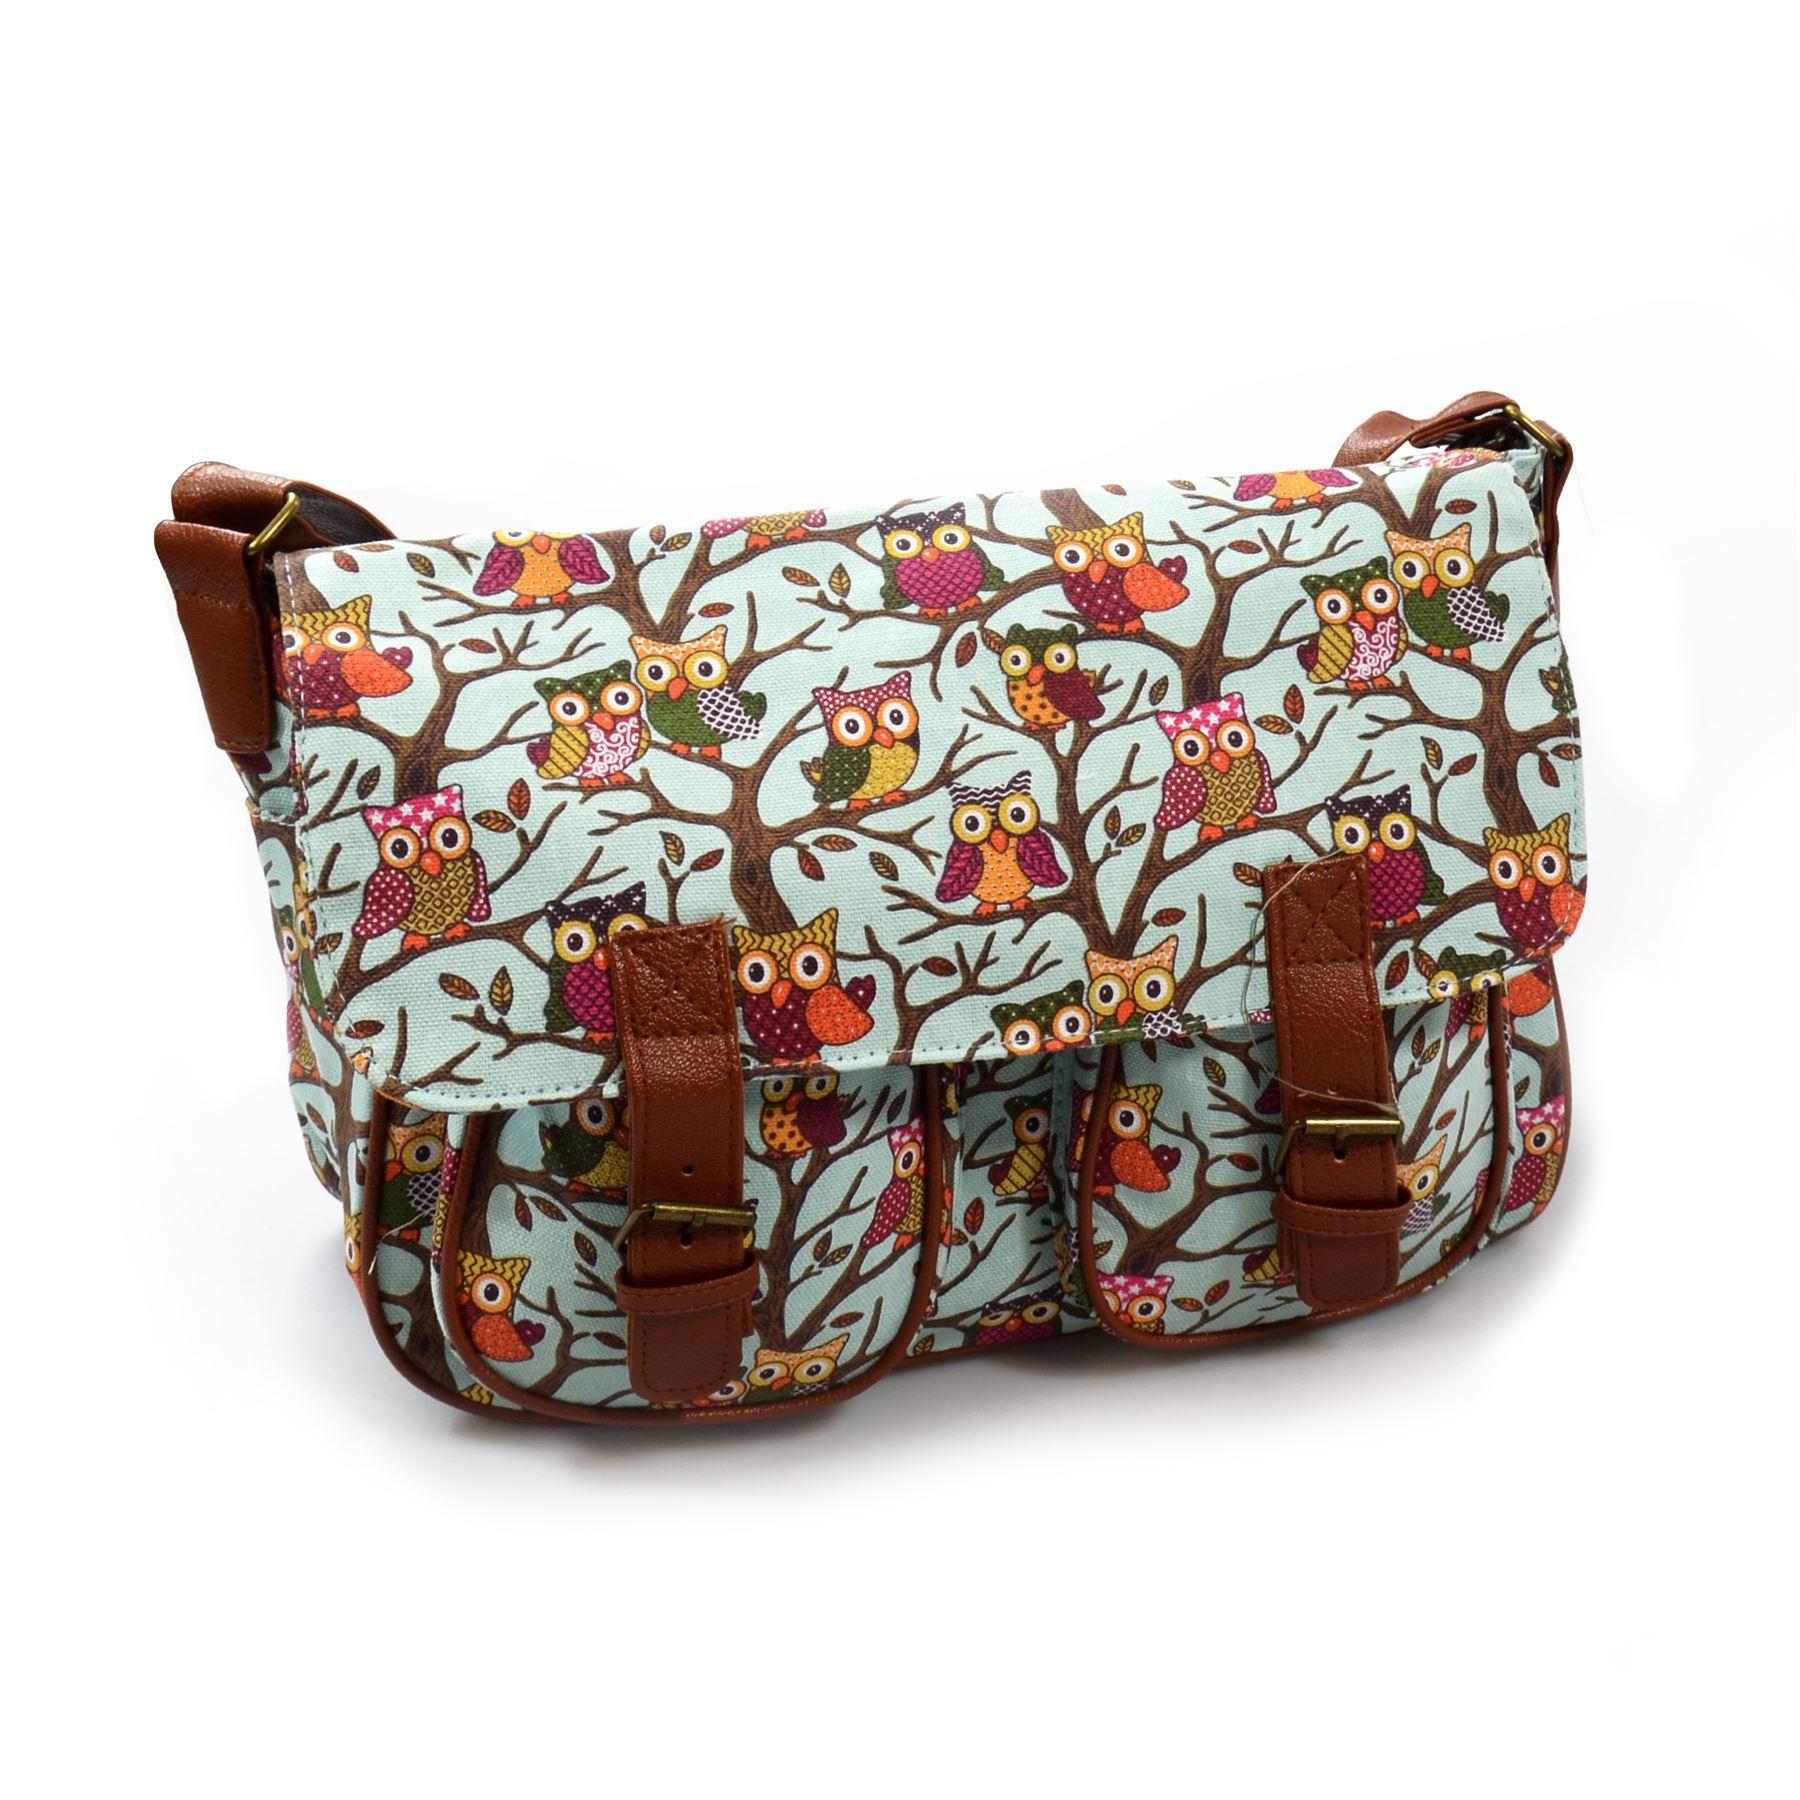 ... Fashion-Owl-Messenger-Bag-Cross-Body-Tote-School-Travel-Girls-Satchel